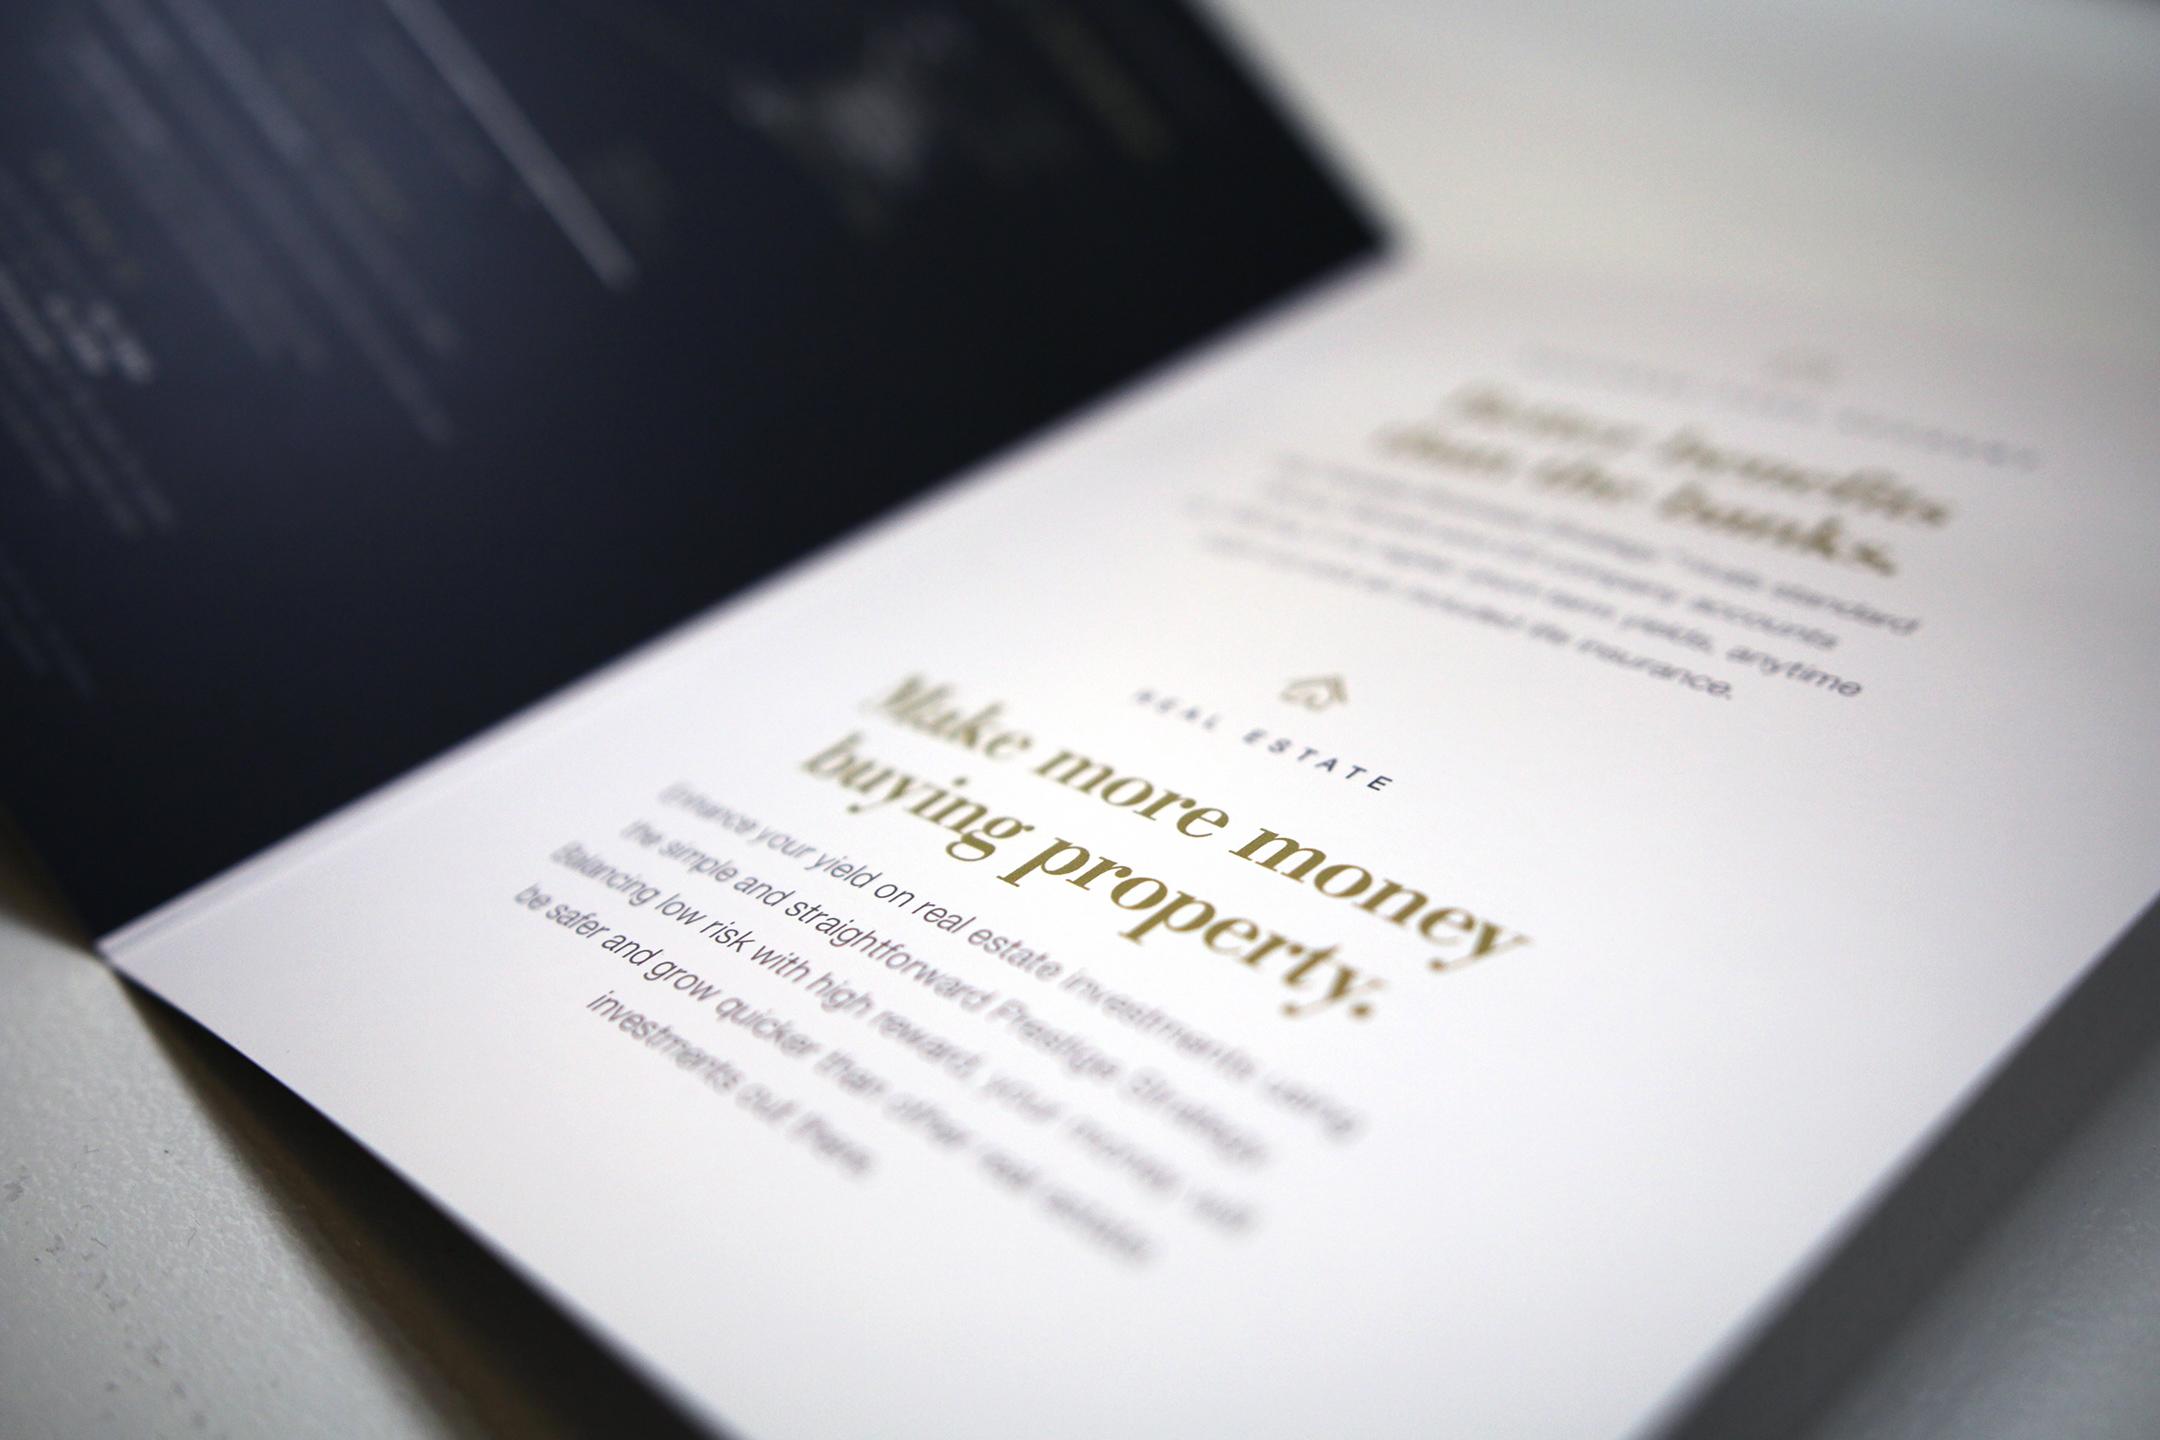 Csf brochure detail 1